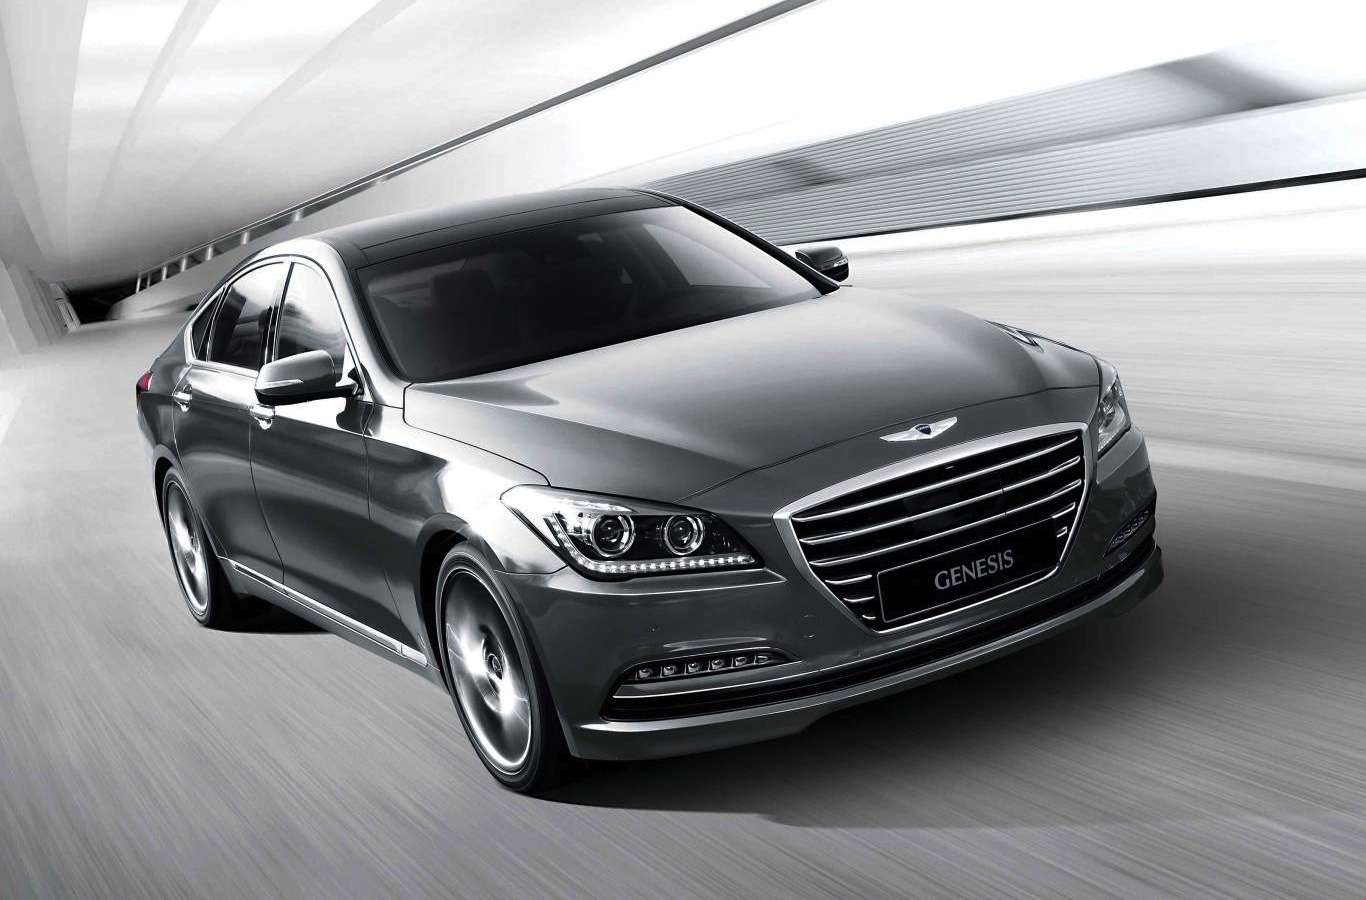 hyundai review genesis reviews autoweek sedan interior article car notes